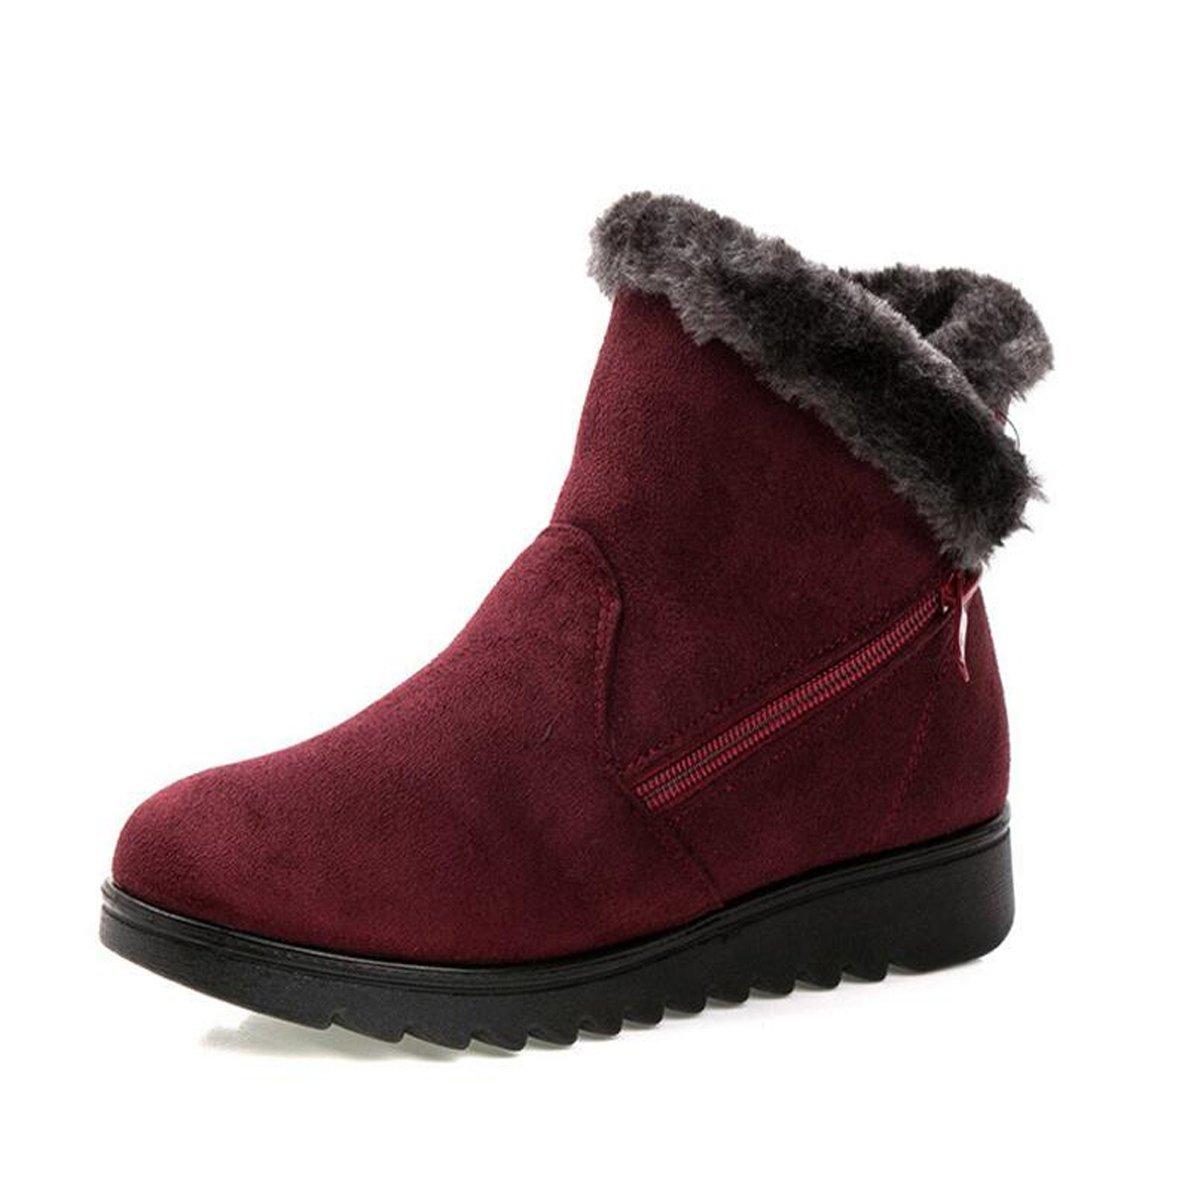 Dear Time Women Winter Warm Button Snow Boots B075FVV9RG 6 B(M) US|Red Wine Zipper